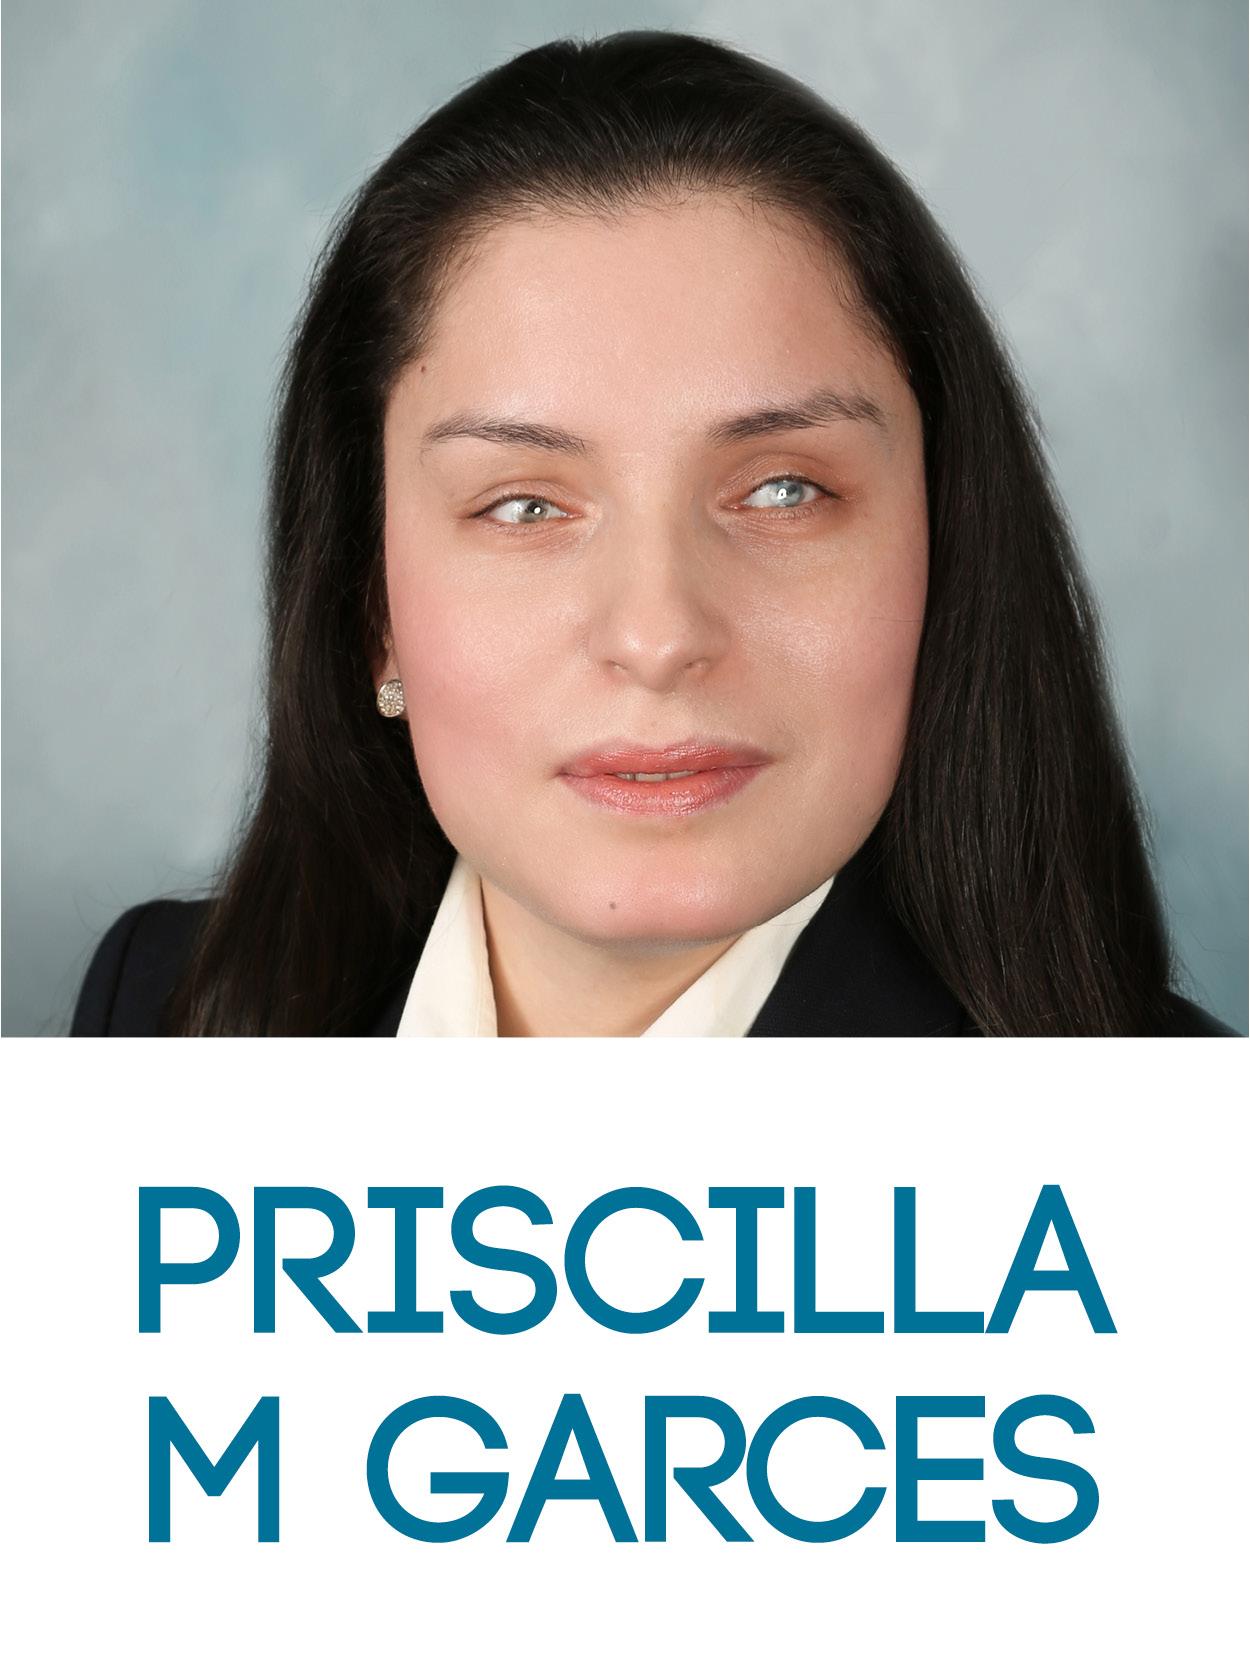 2019-Pricilla_M_Garces.jpg